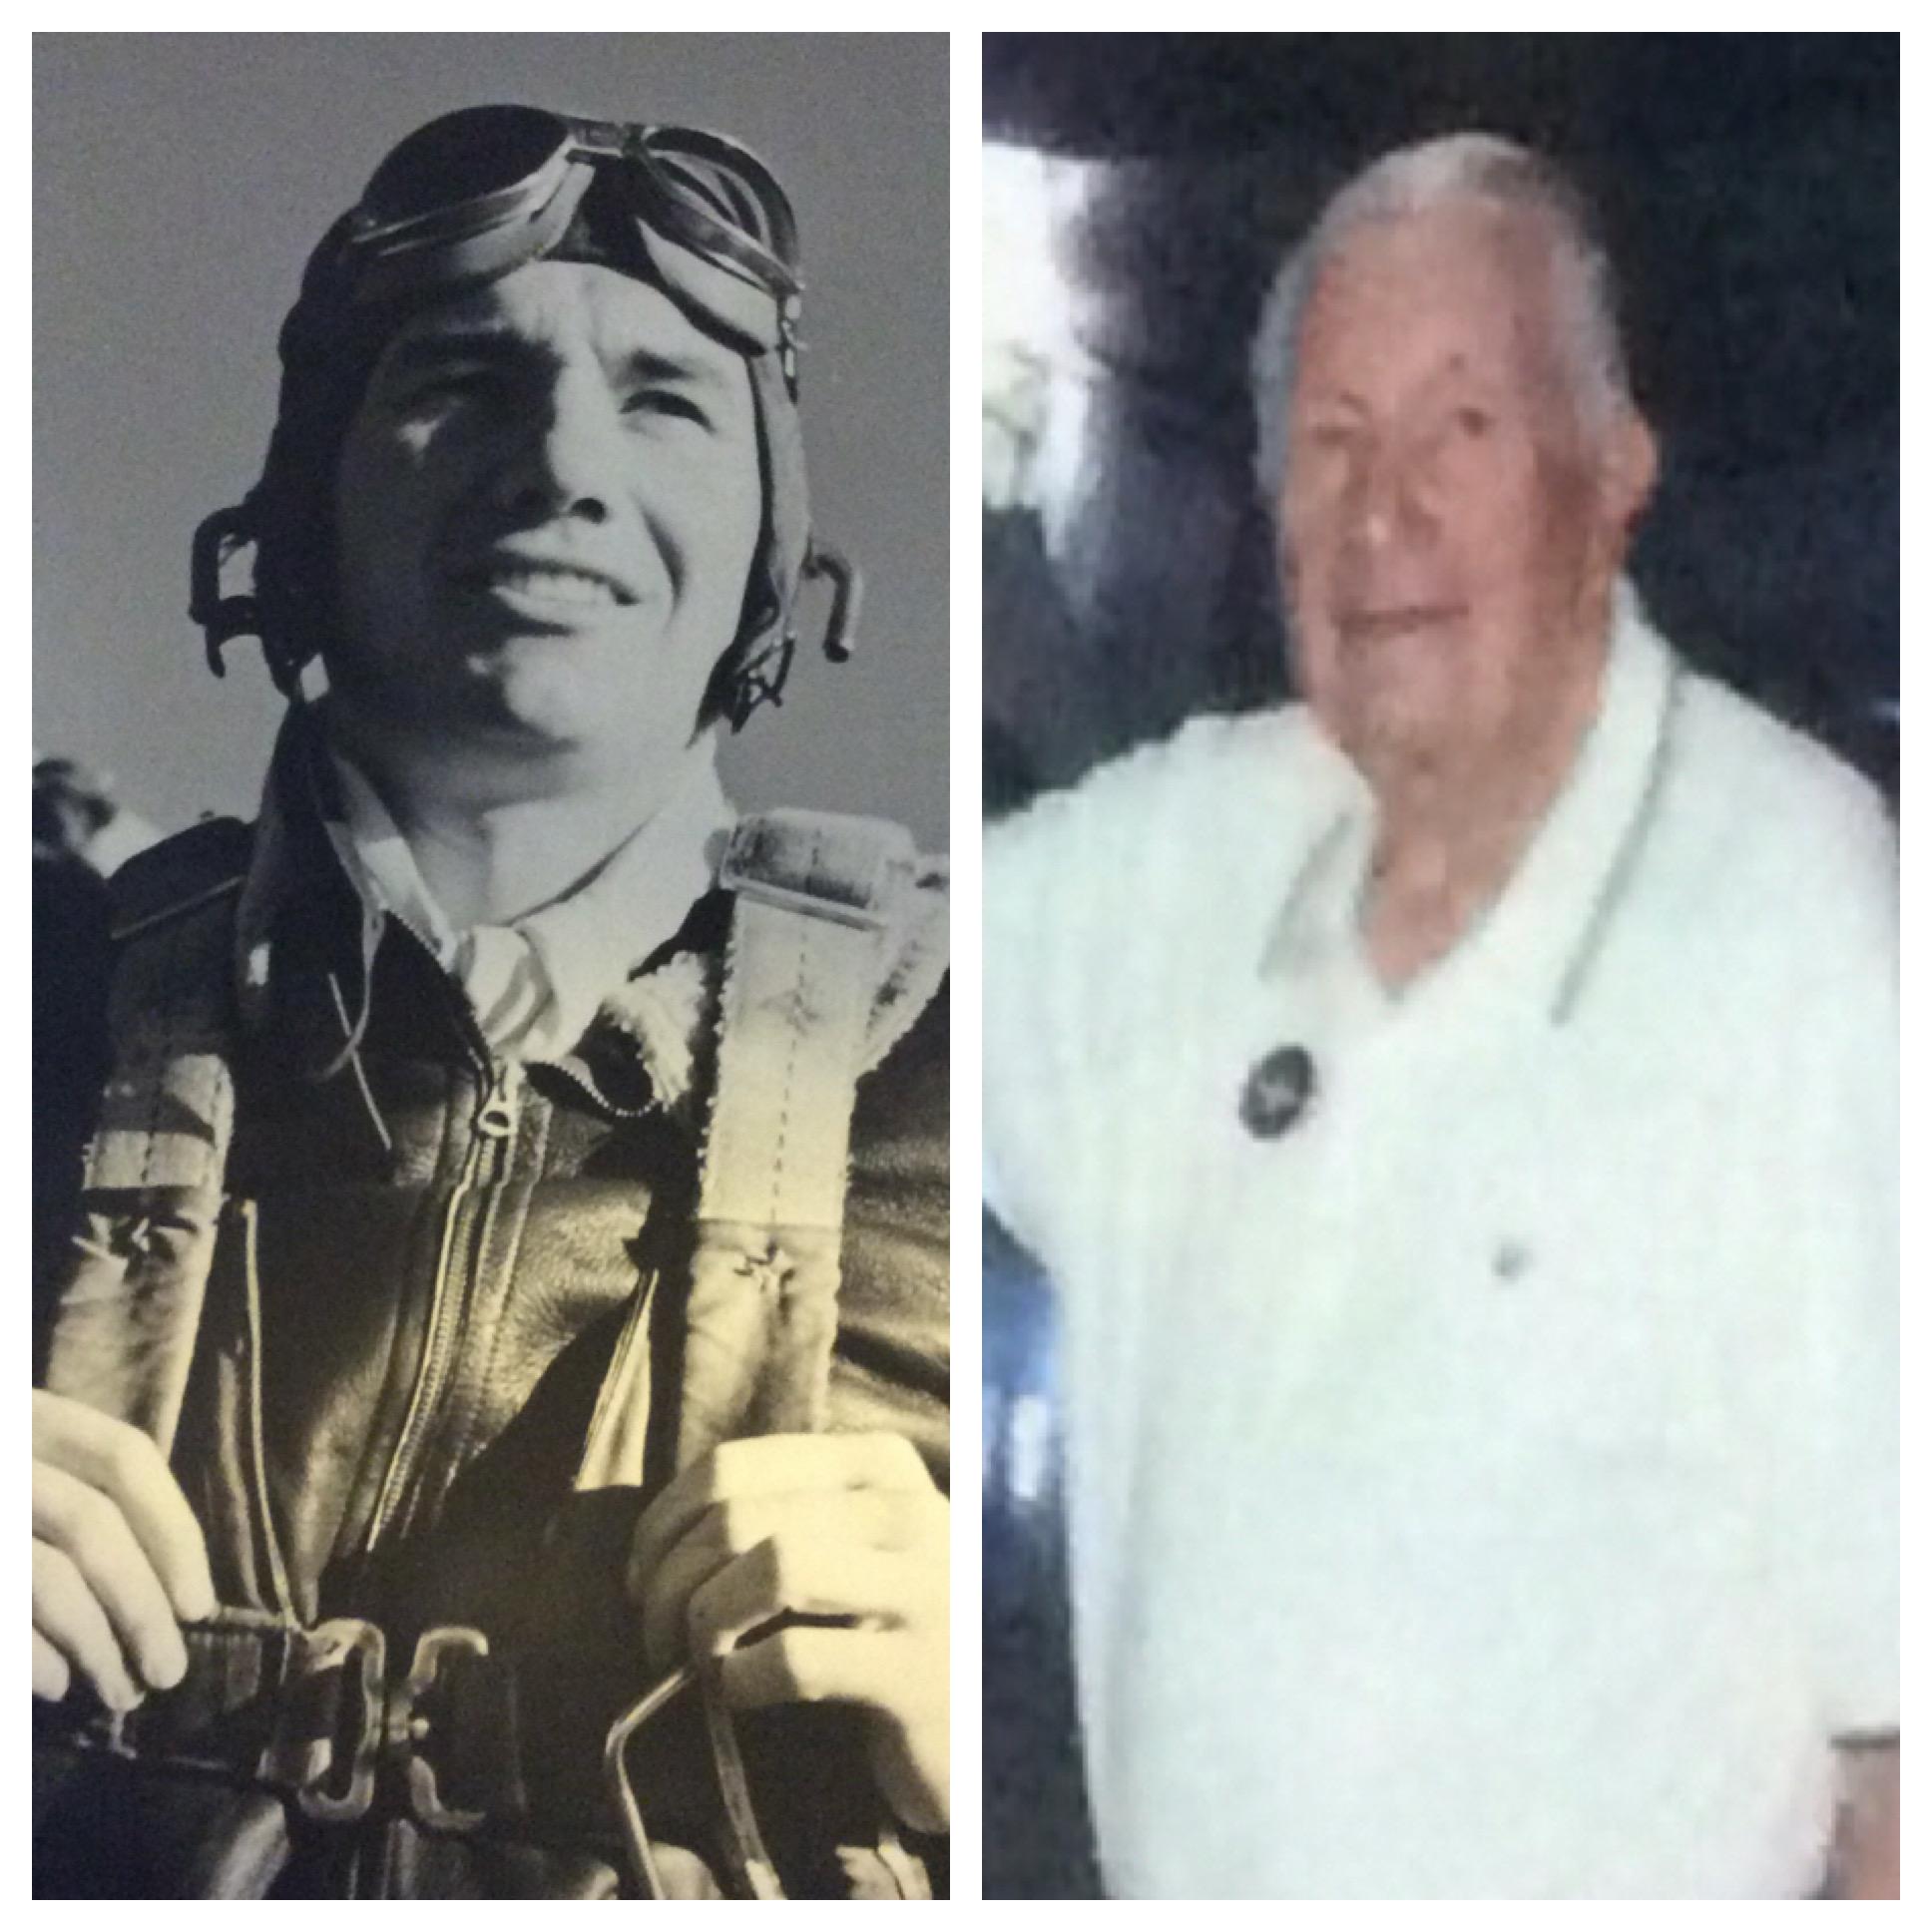 https://americasveteransstories.com/wwii-project/john-coates-82nd-airborne/